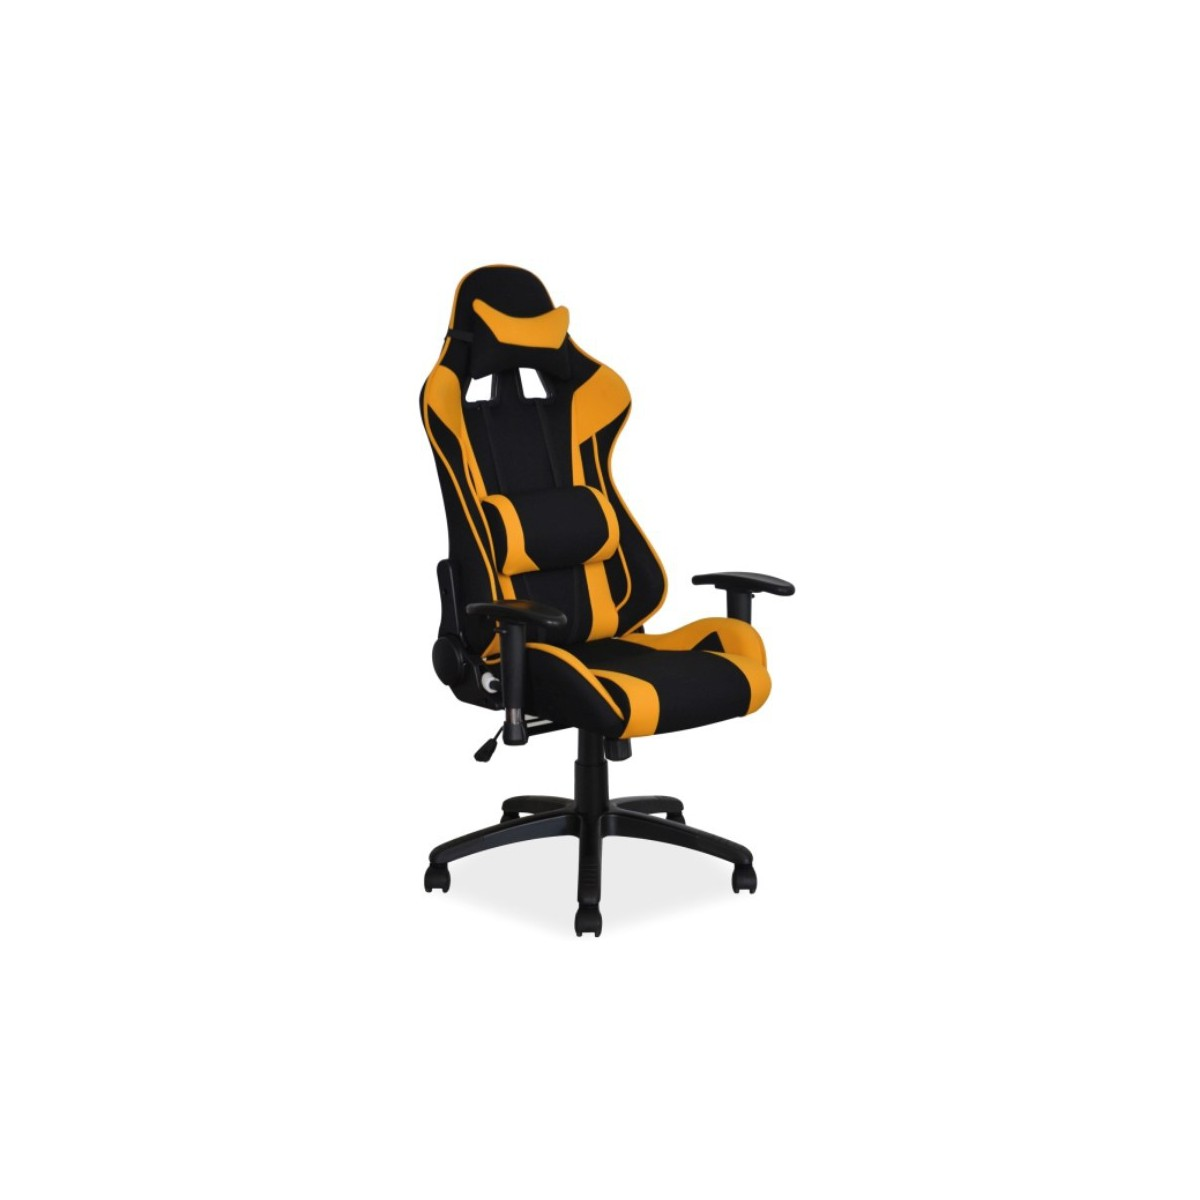 Fotel Gamingowy Viper